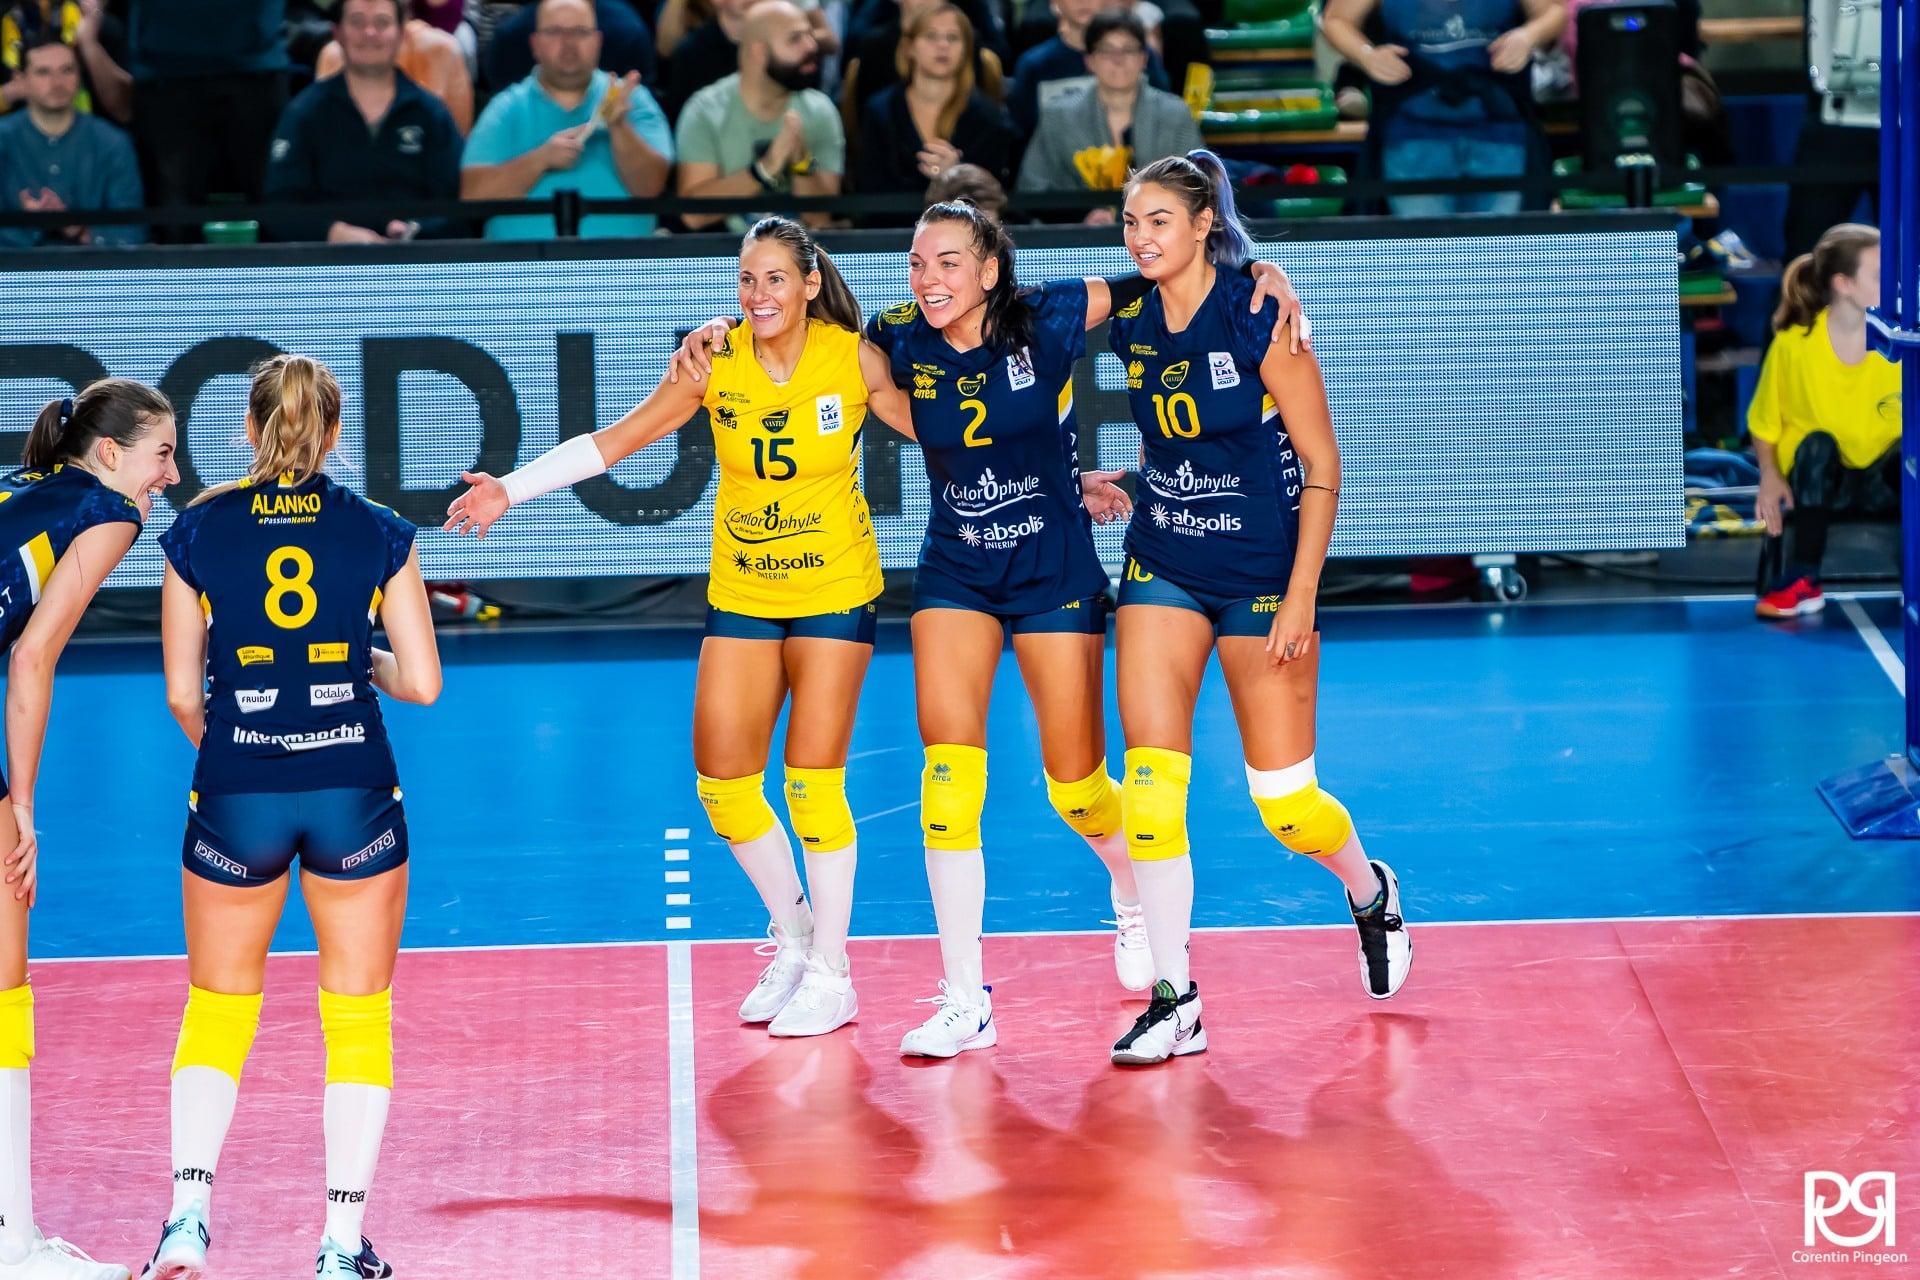 maillot-volley-vbn-ligue-des-champions-2019-2020-errea-1